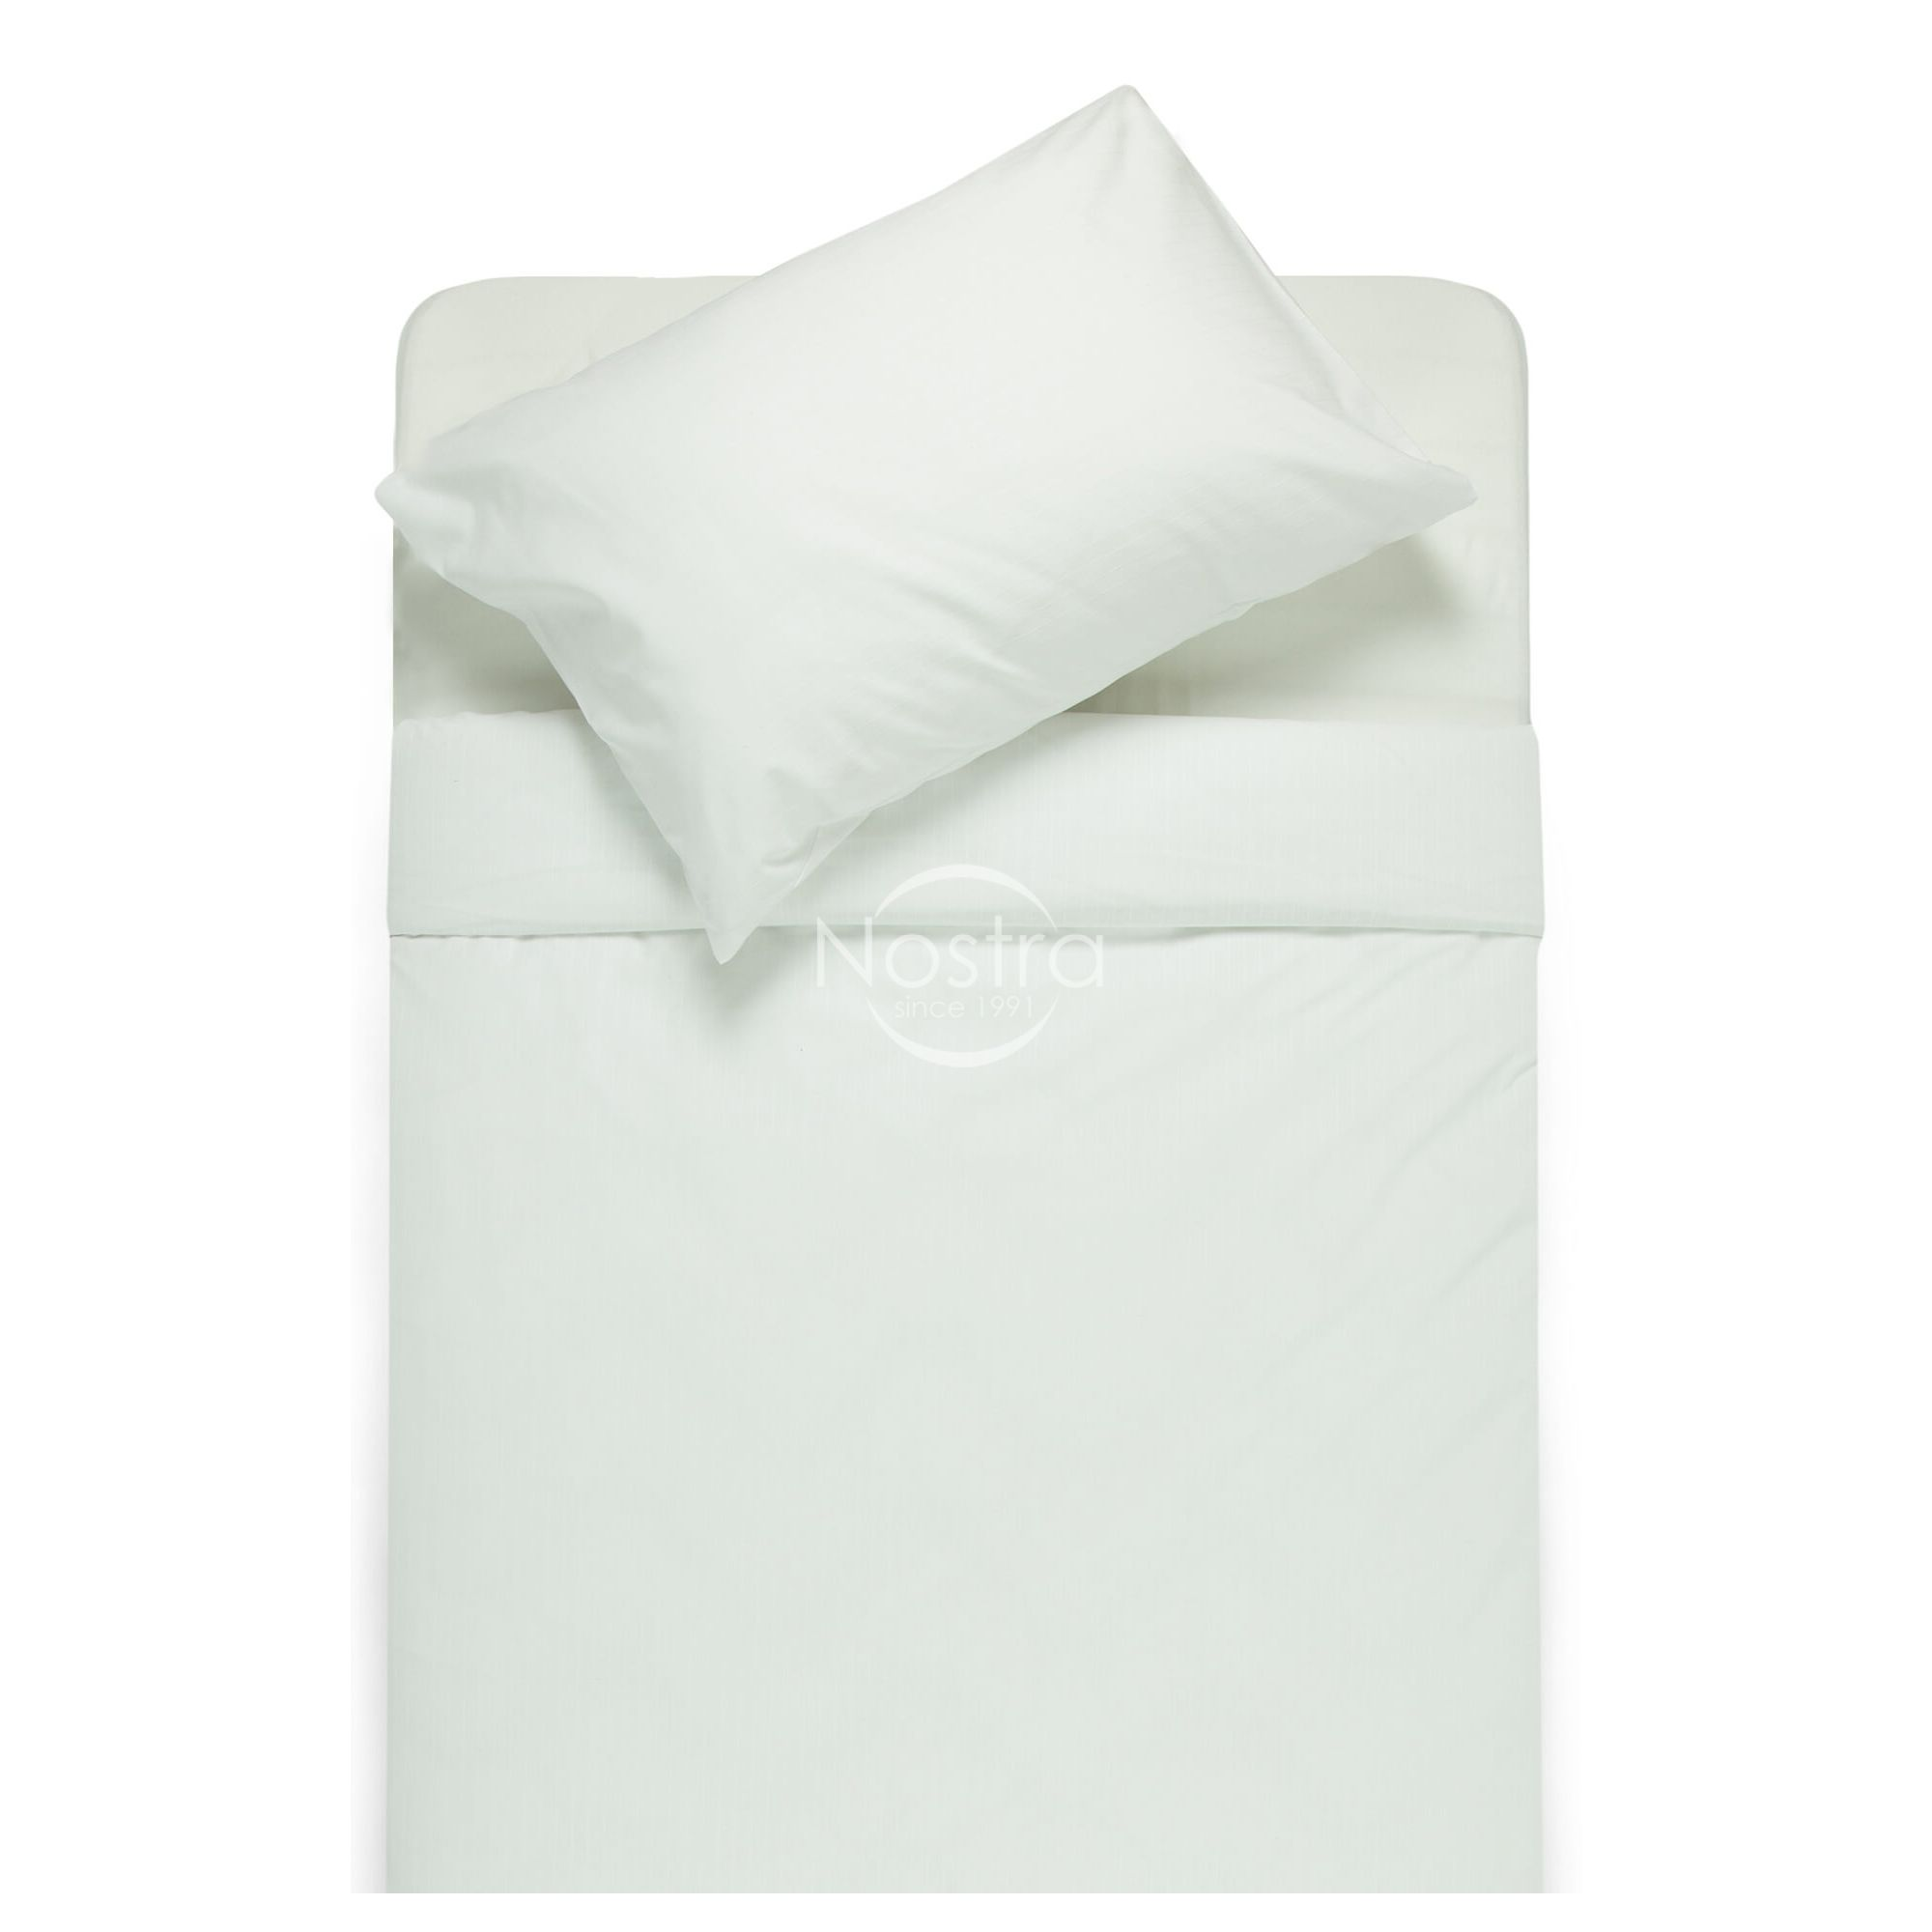 Segas pārvalks 406-BED 00-0000-OPT.WHITE